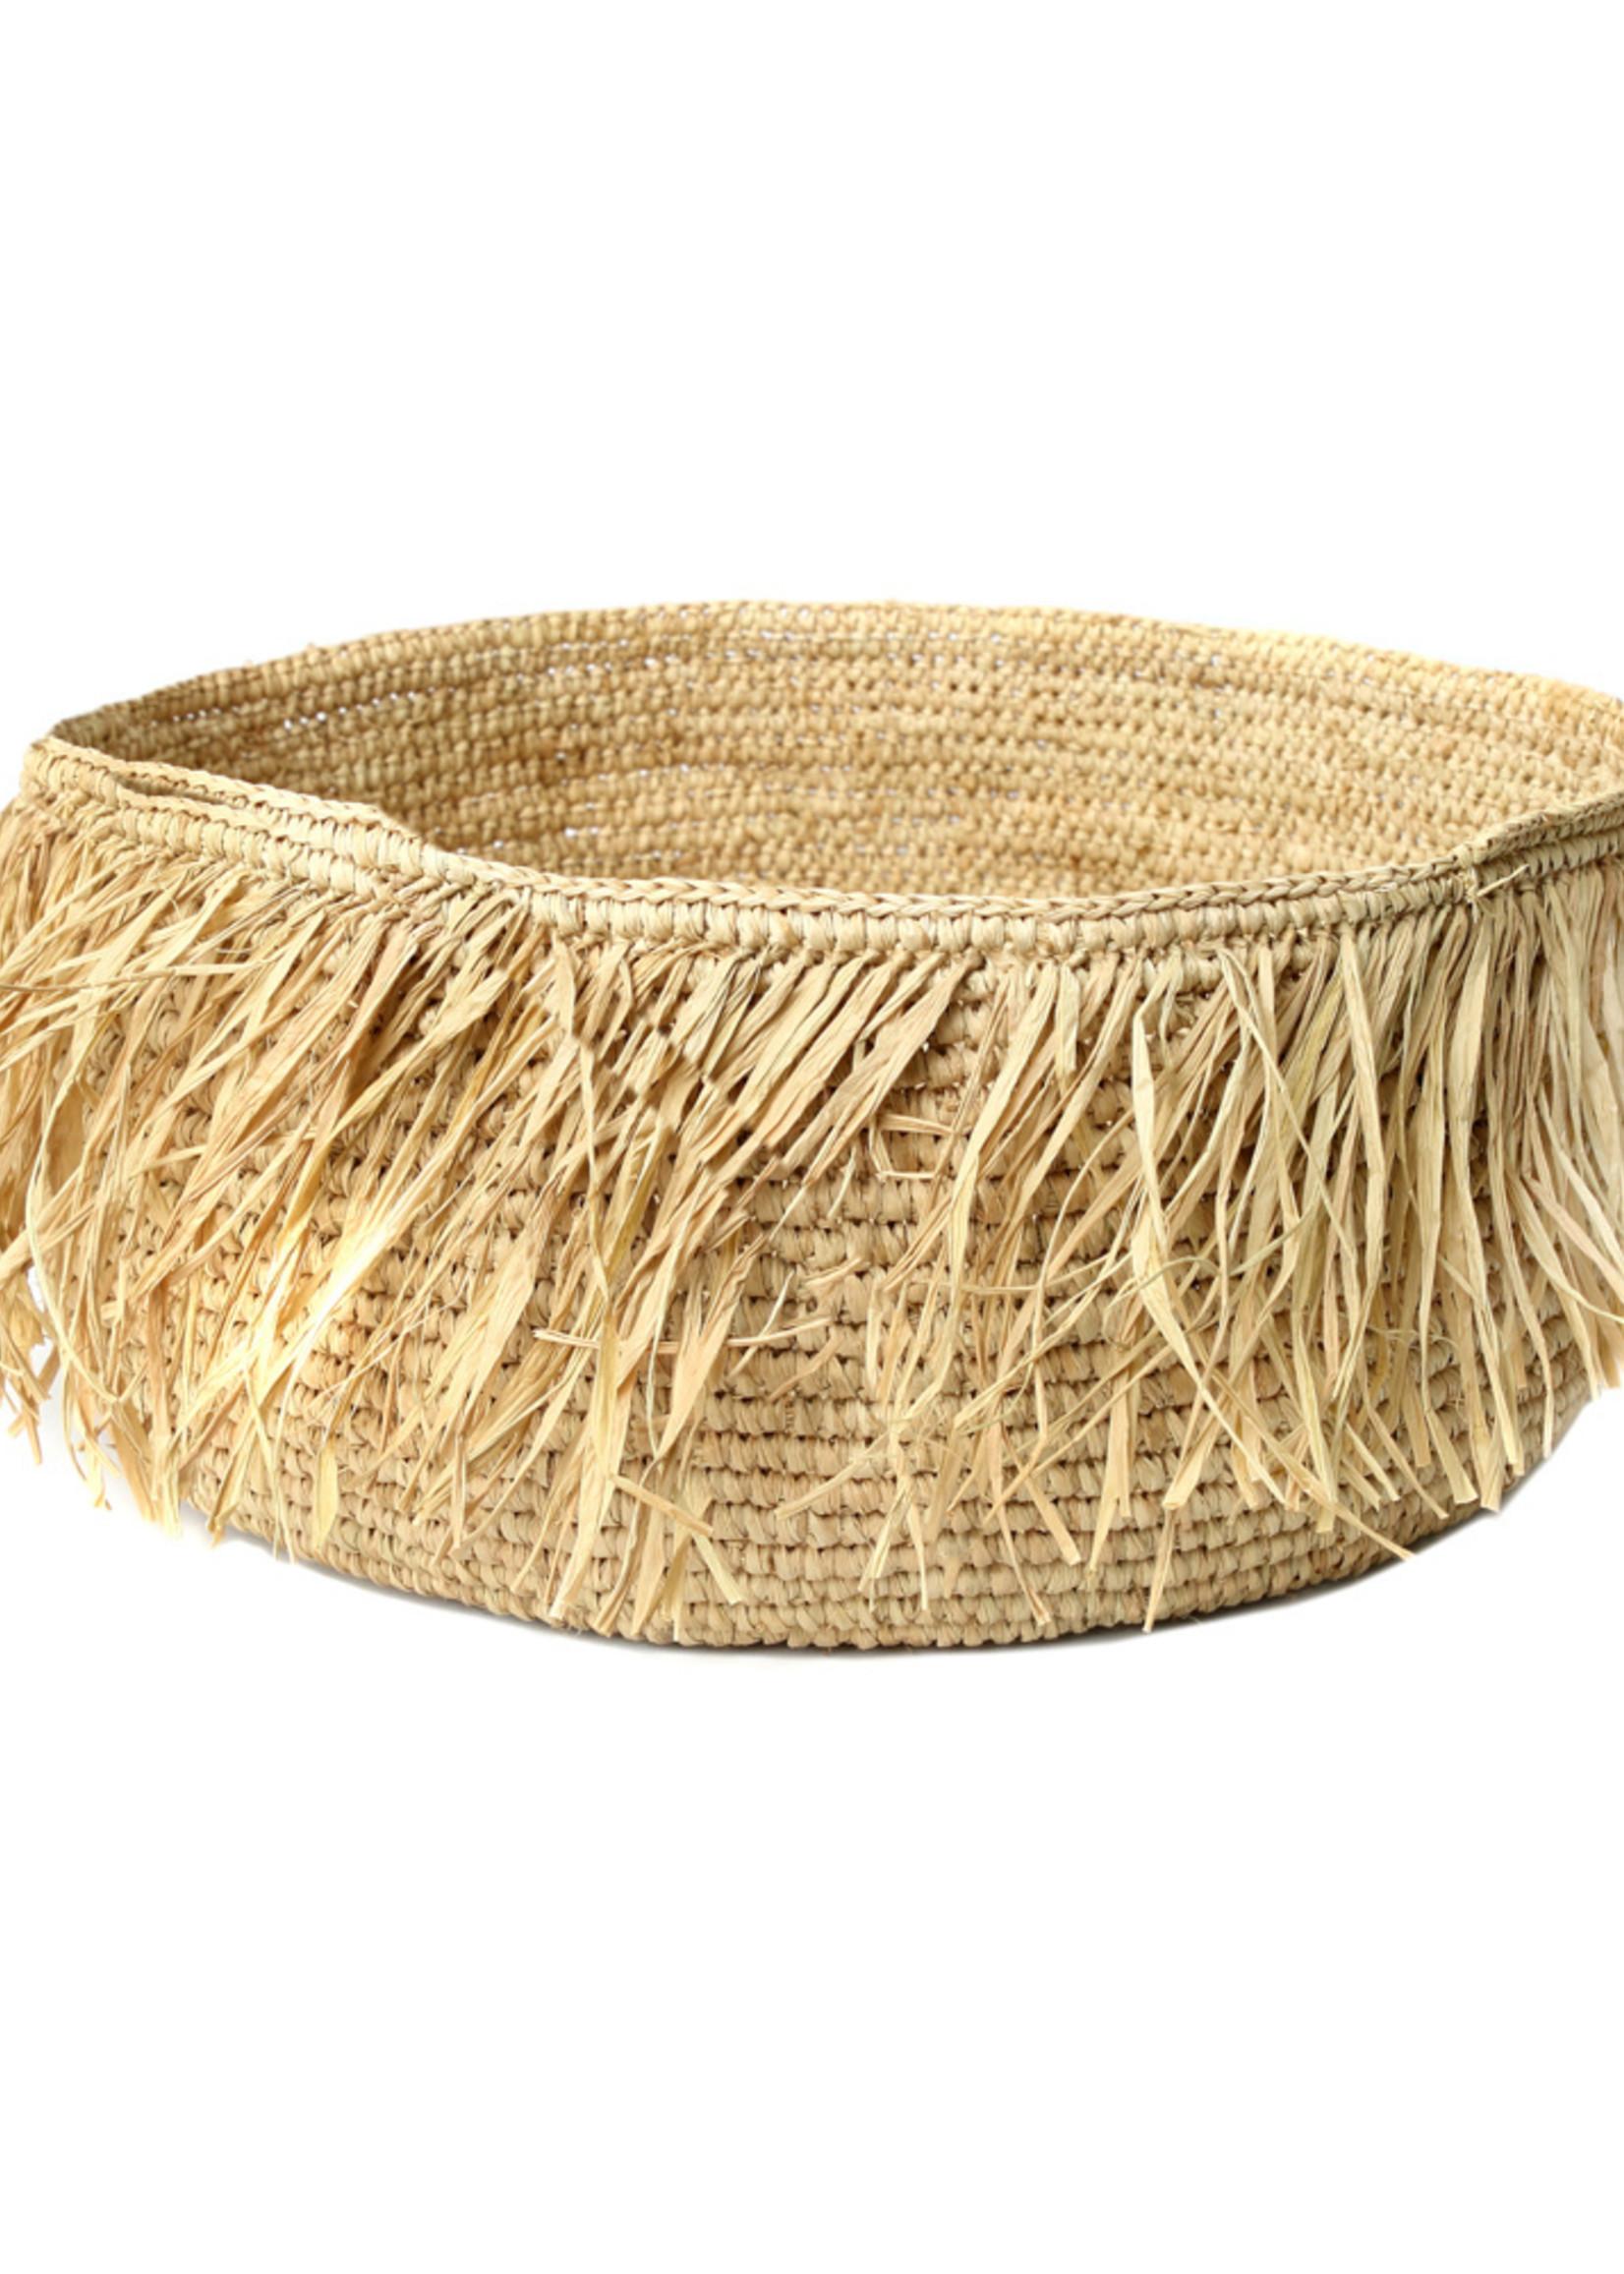 The Raffia Bowl - Natural - L